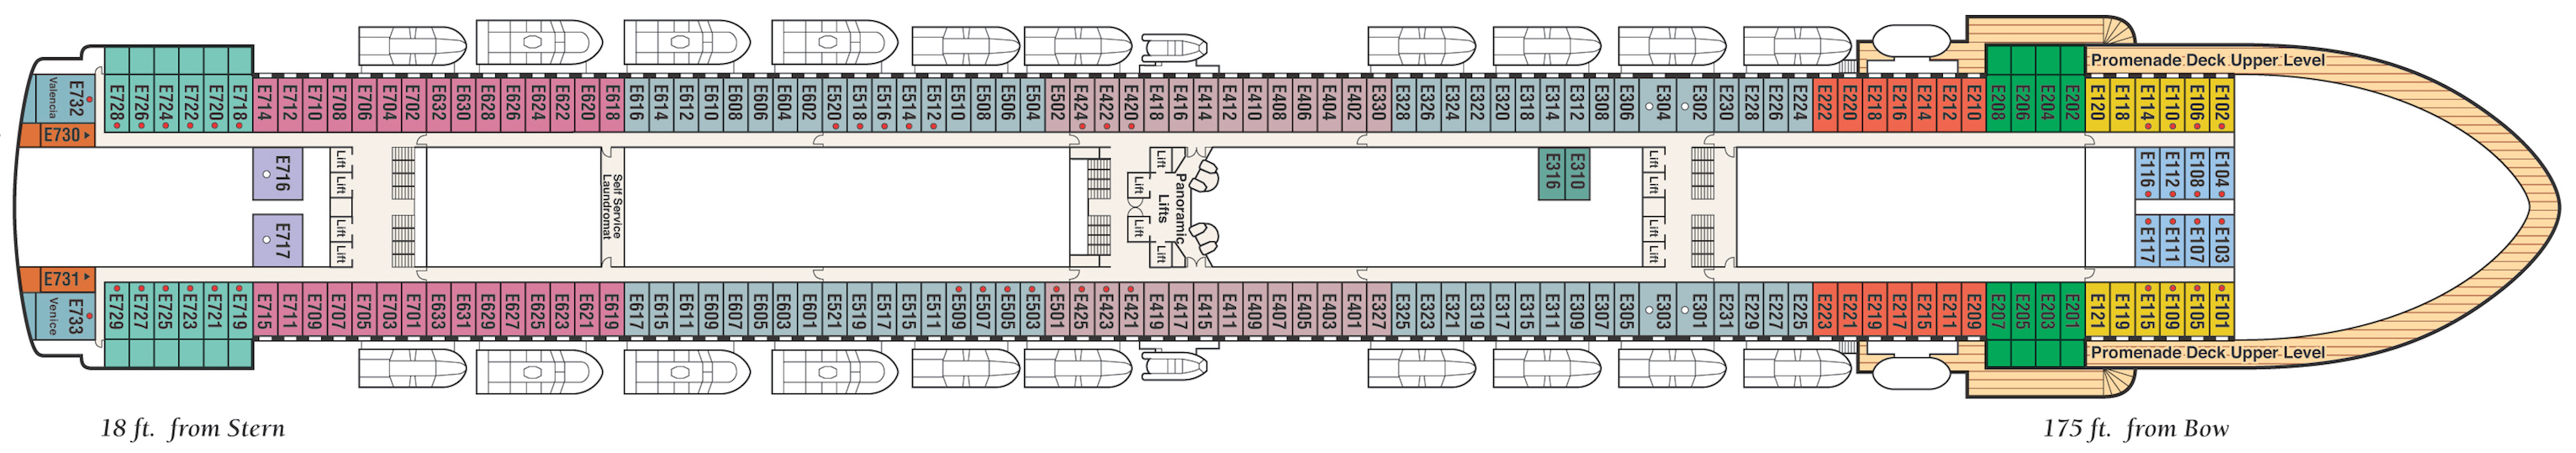 Princess Cruises Grand Class Golden Princess Deck 8.jpg